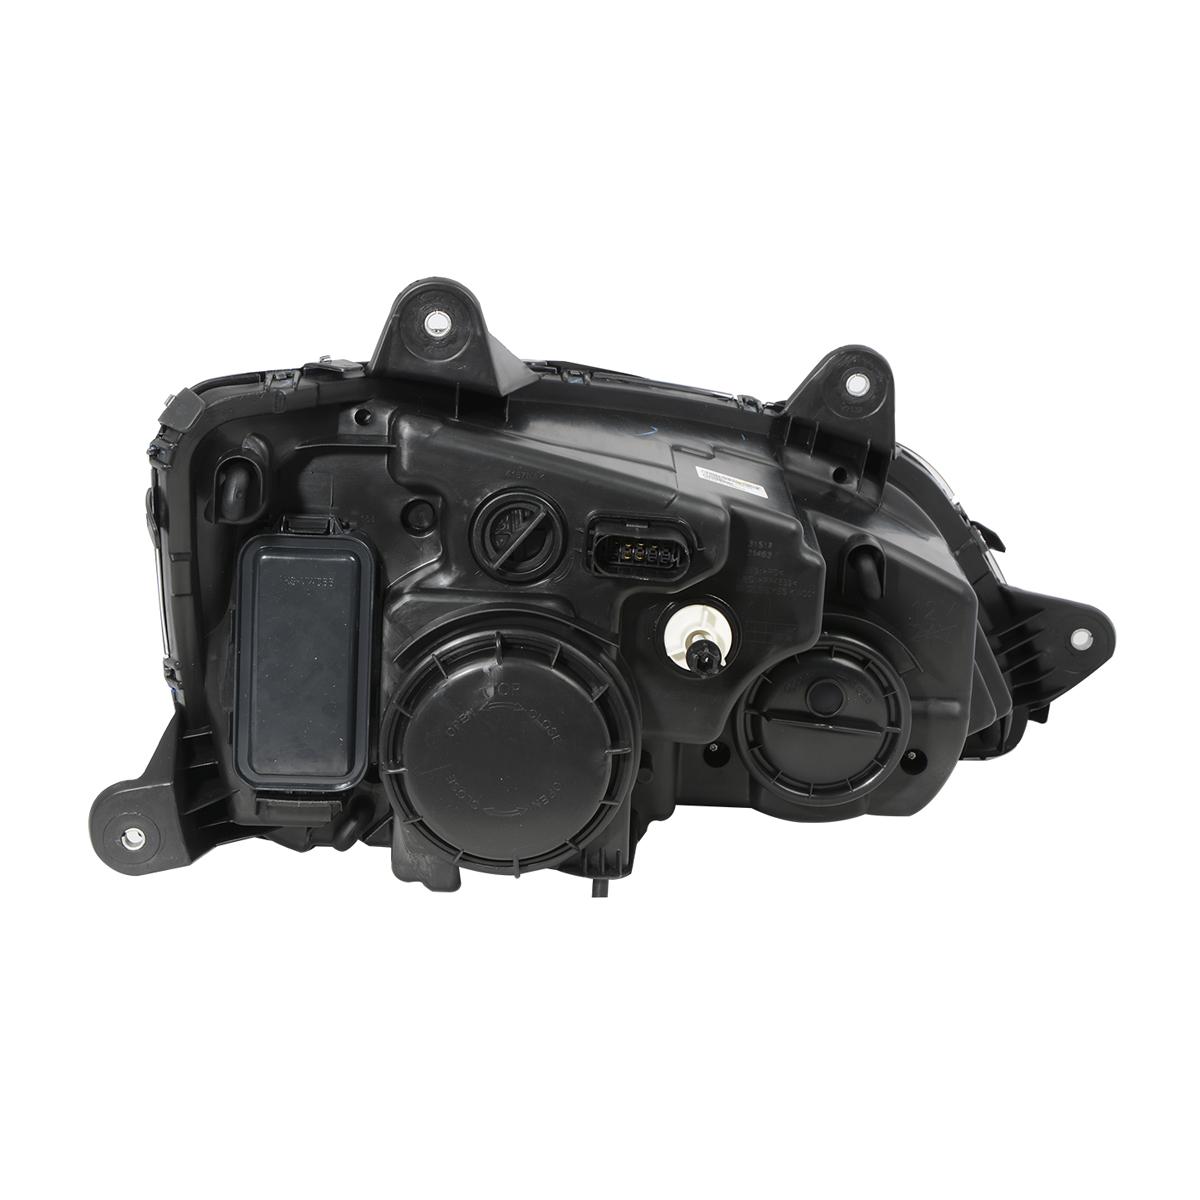 Back View - Kenworth T660 Matte Black Projection Headlight w/ LED Turn Signal & White LED Running Light